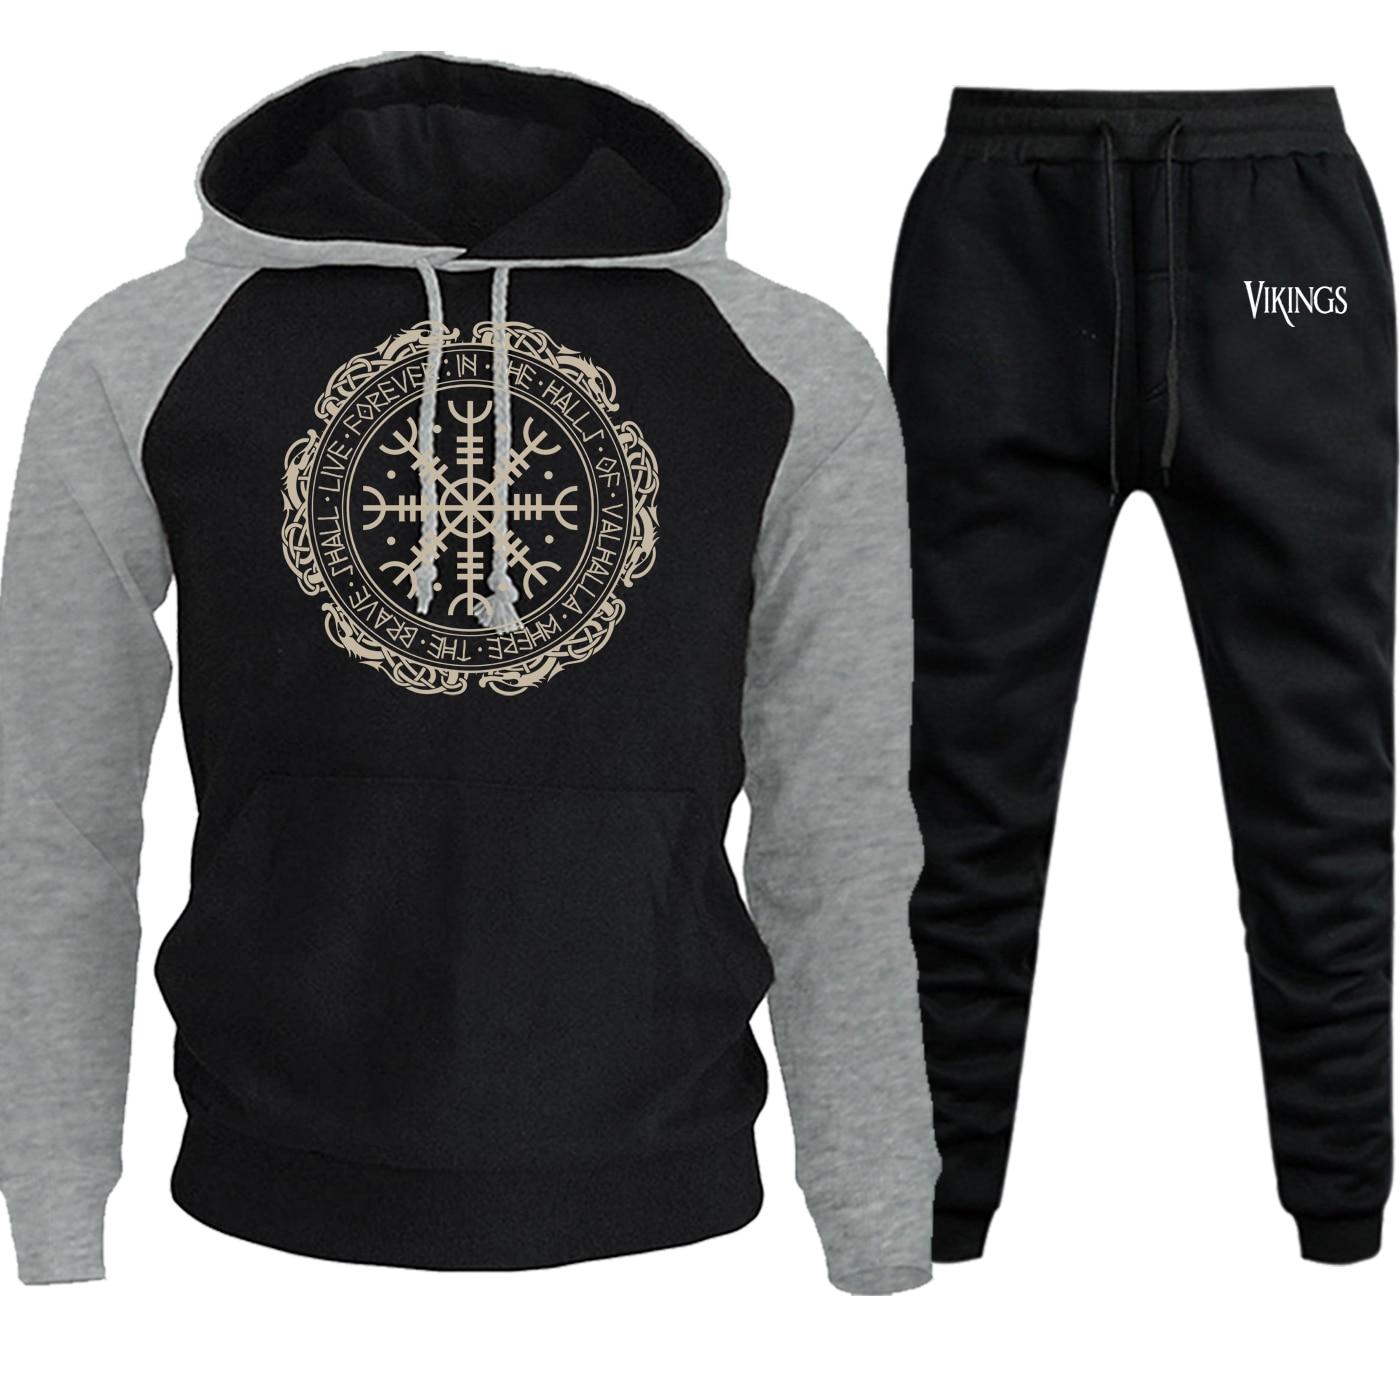 Vikings Fashion Sweatshirts Men Raglan Hoodies Autumn Winter 2019 New Casual Pullover Suit Male Fleece Hooded+Pants 2 Piece Set